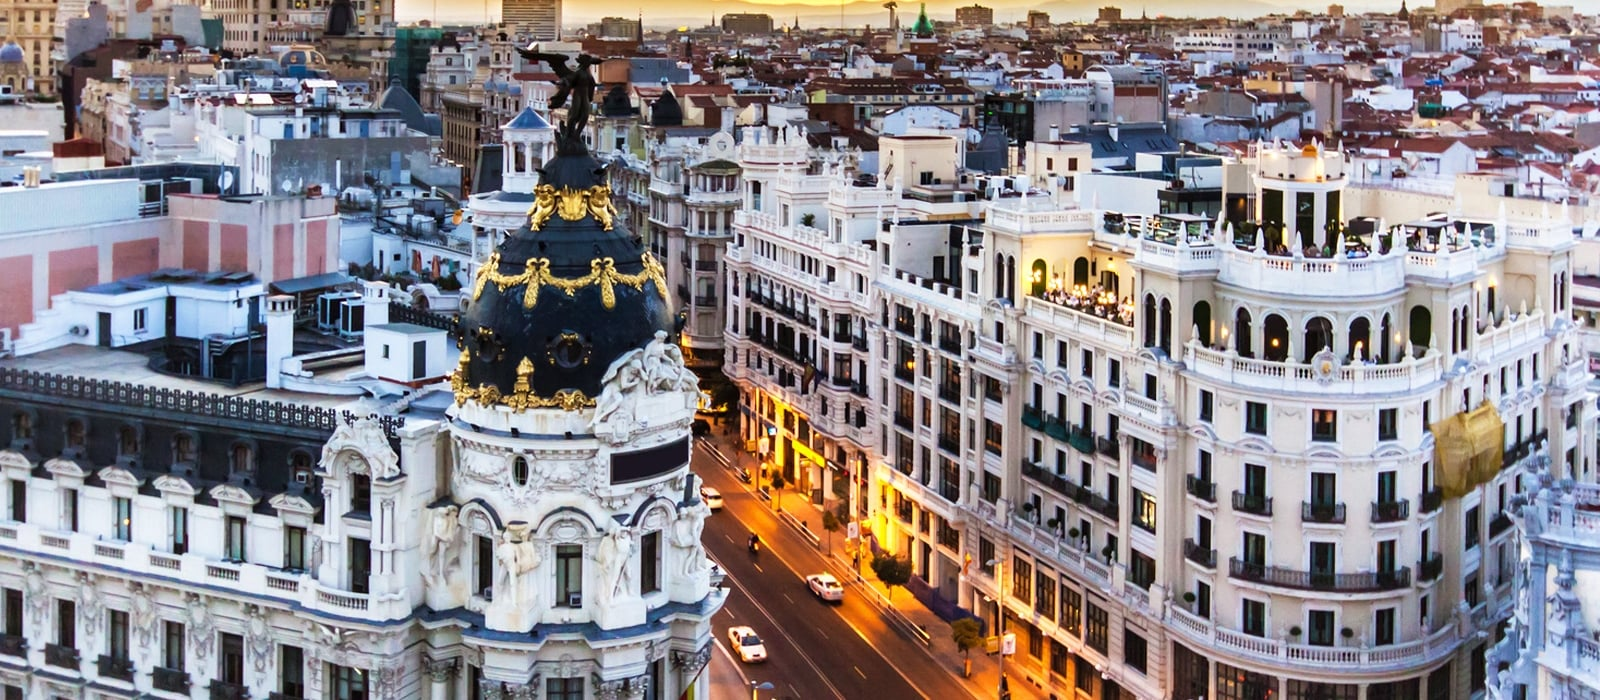 Madrid - Vincci Hoteles